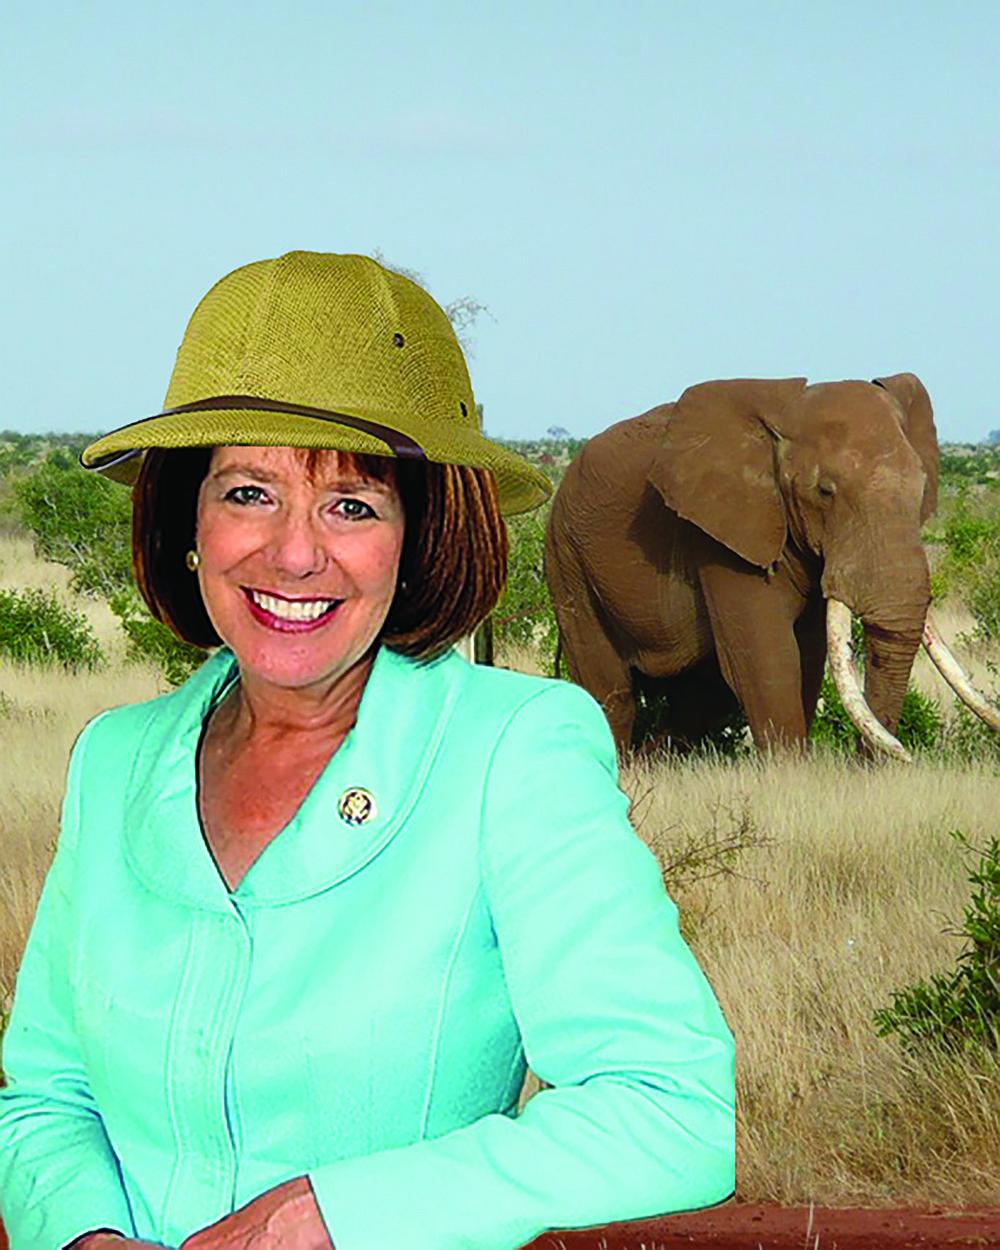 One last free-travel safari for soon-to-retire Congresswoman Susan Davis.